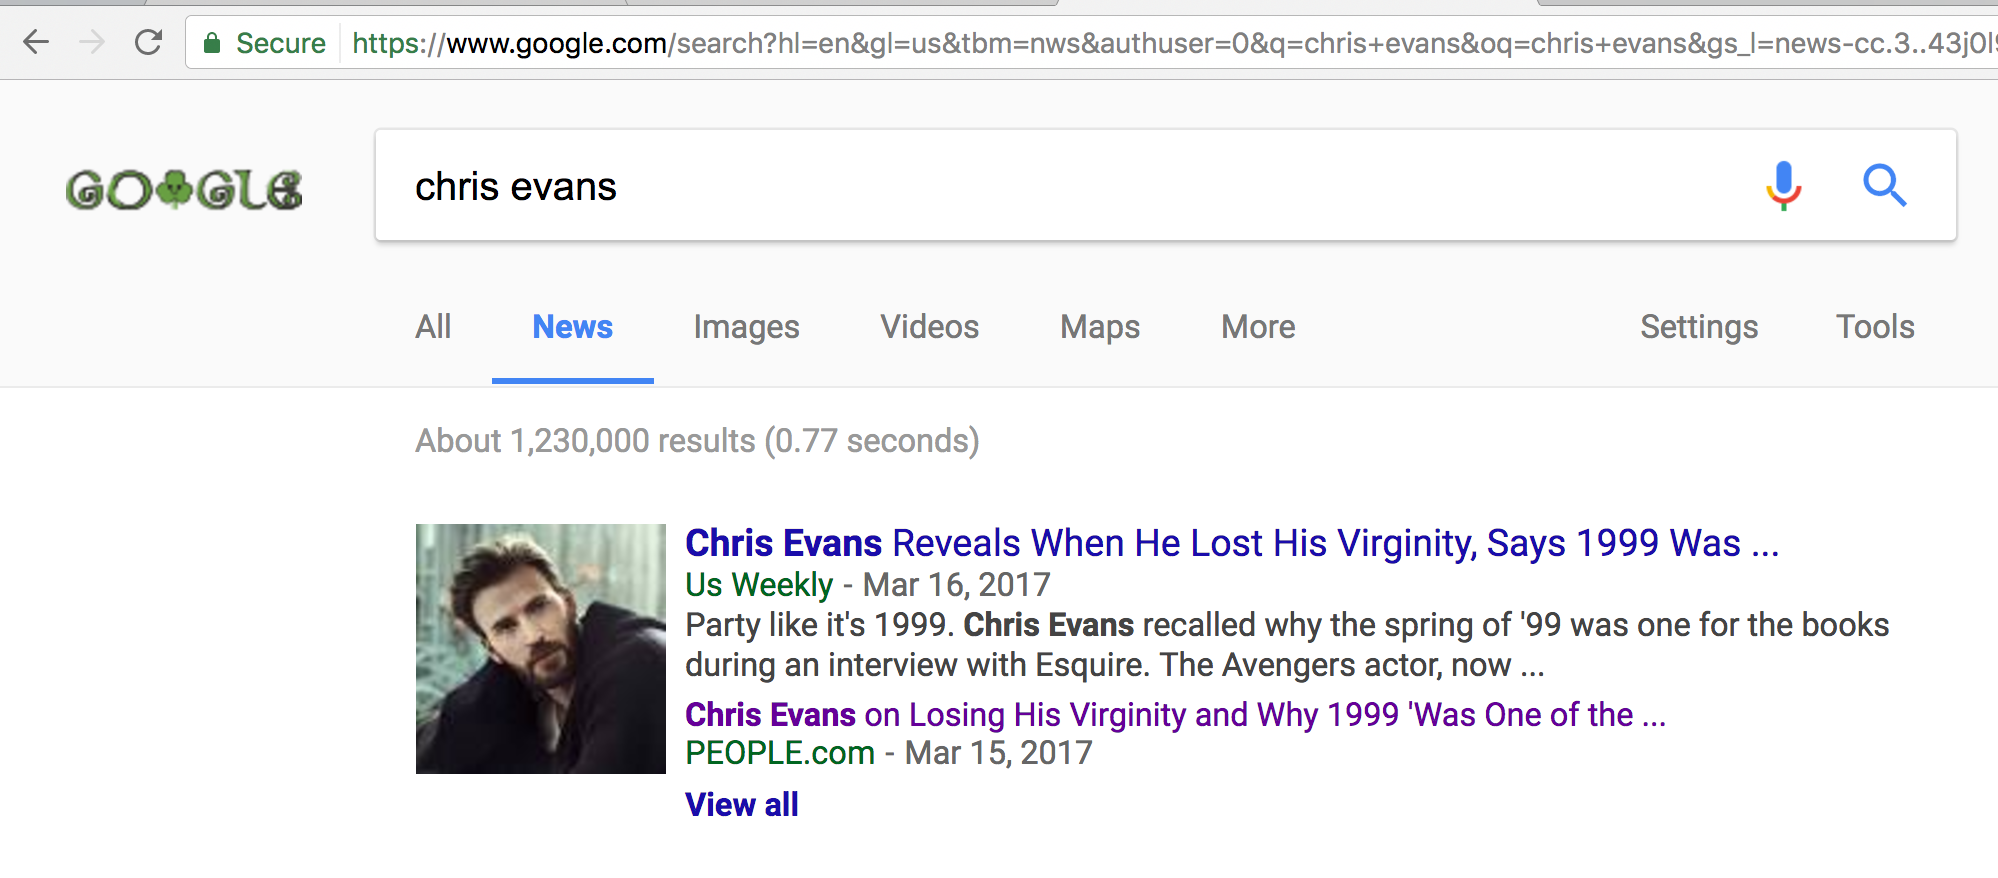 chris evans search results, google news gnews